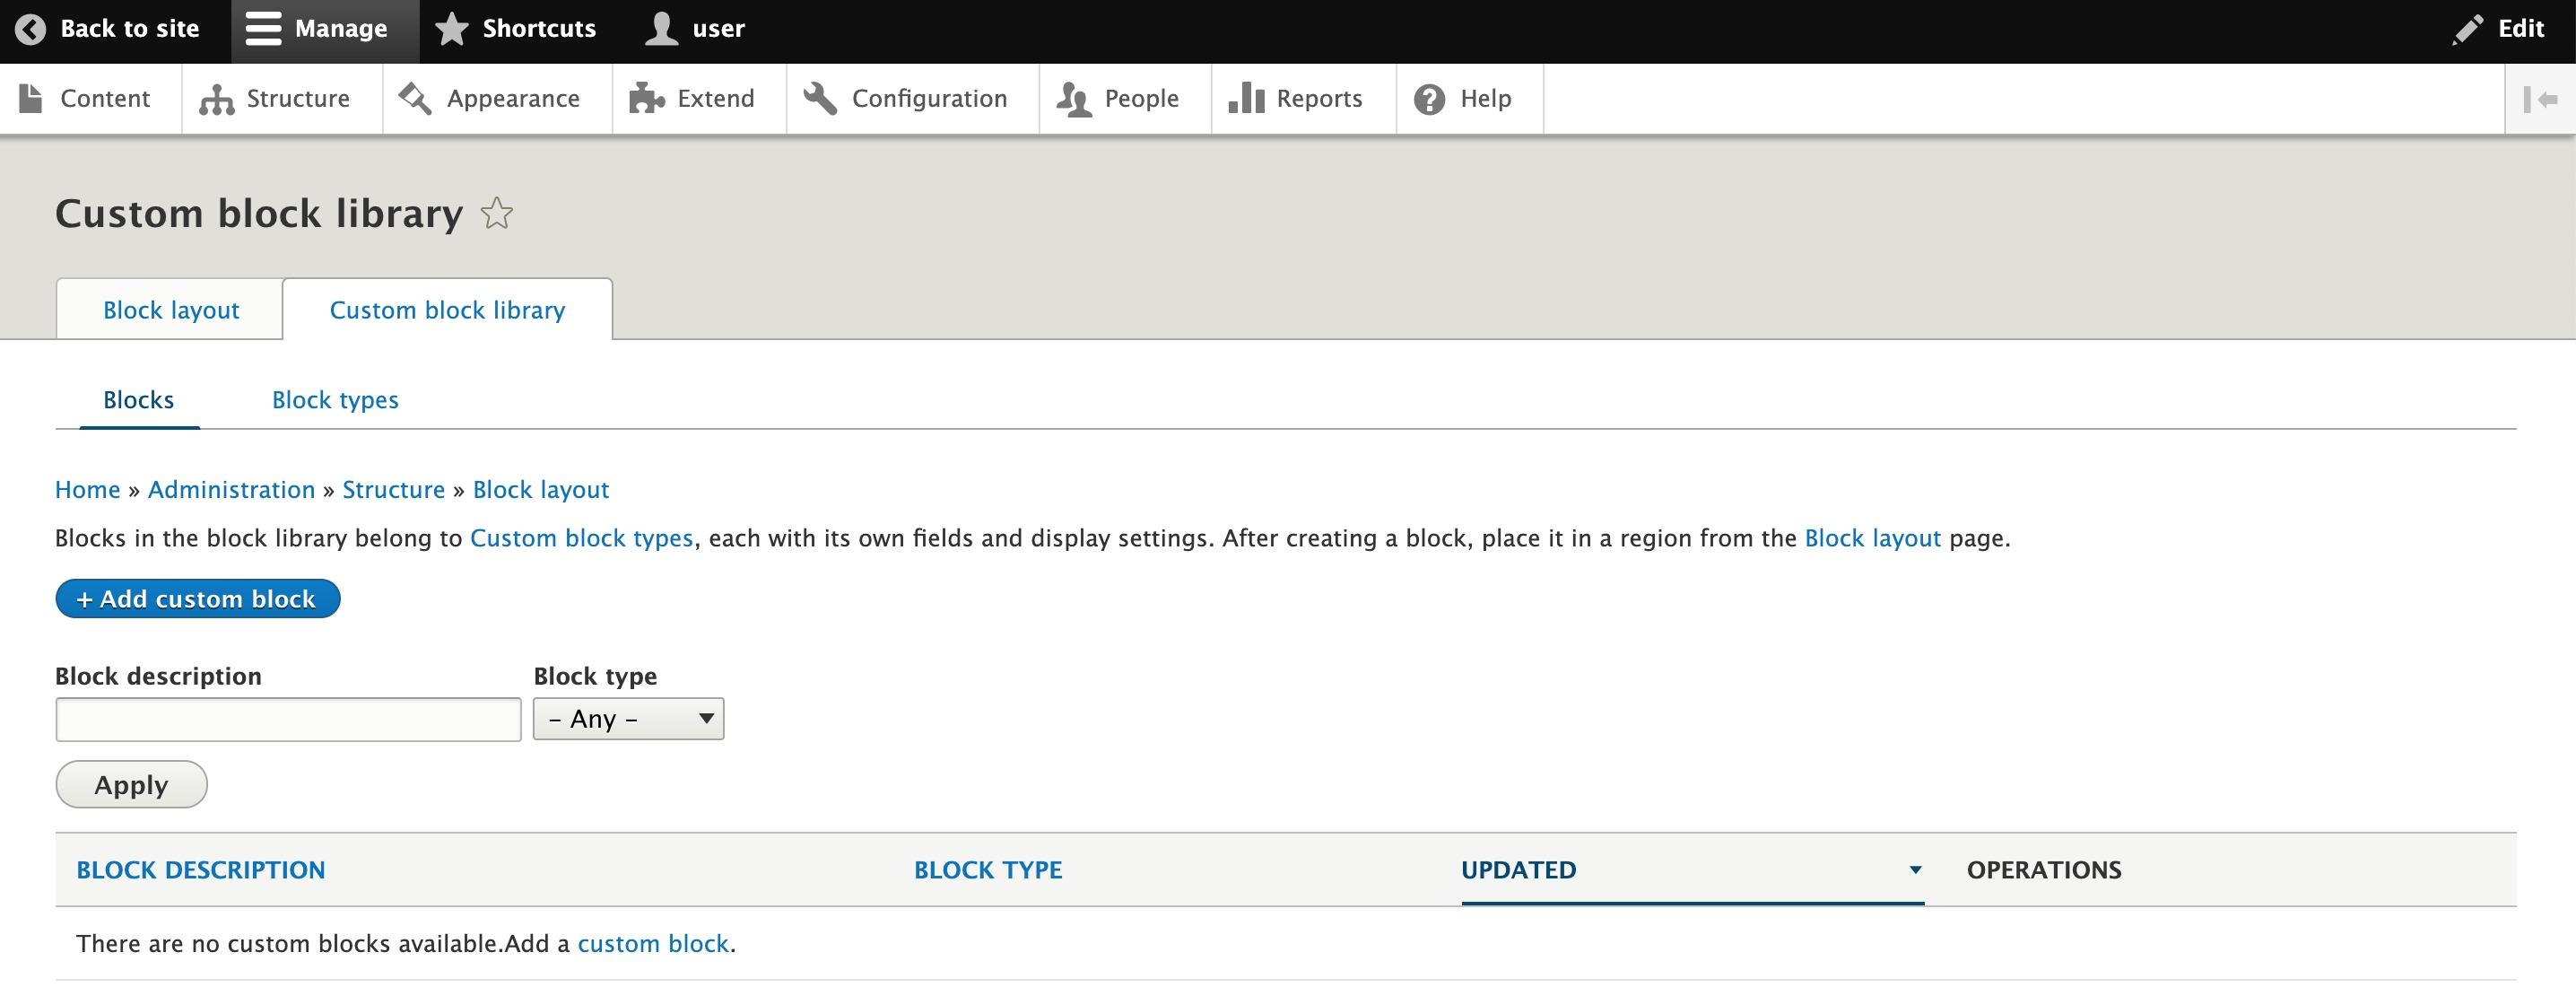 Adding a custom block in Drupal's site management